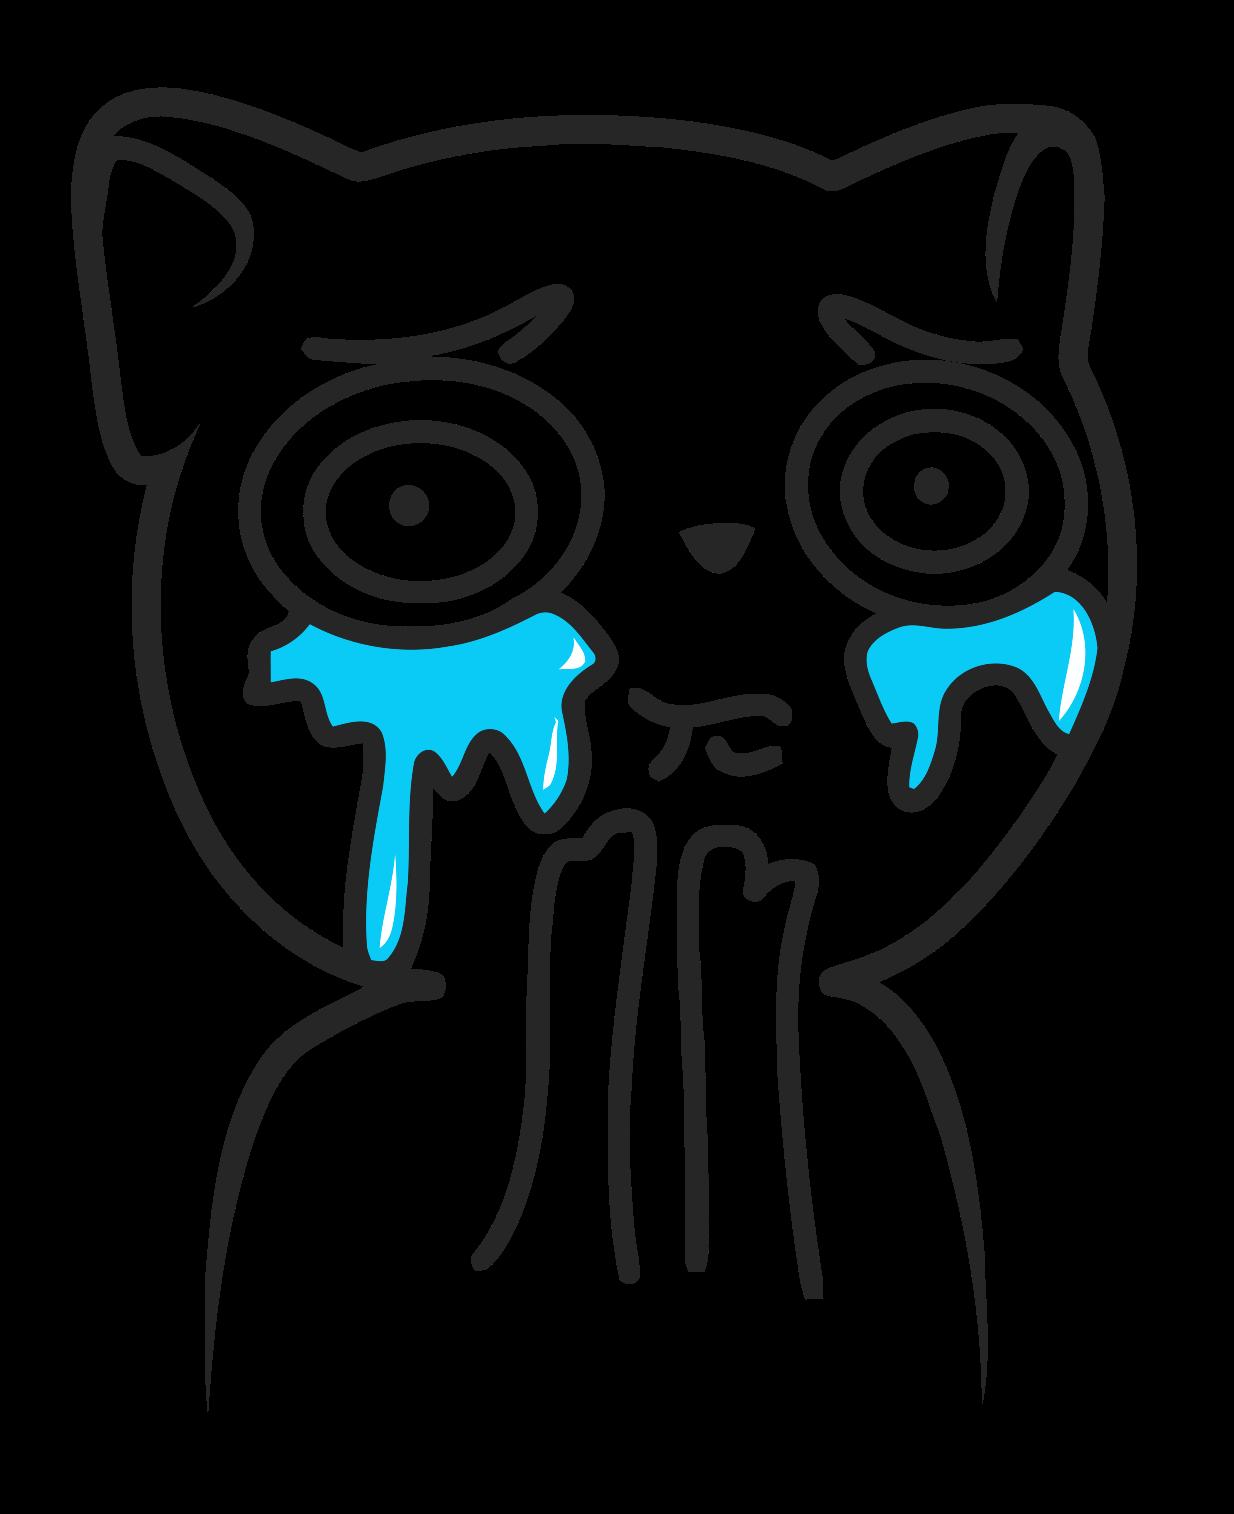 Sad Cat Face Cartoon - Cute Cat 2018 clipart transparent stock